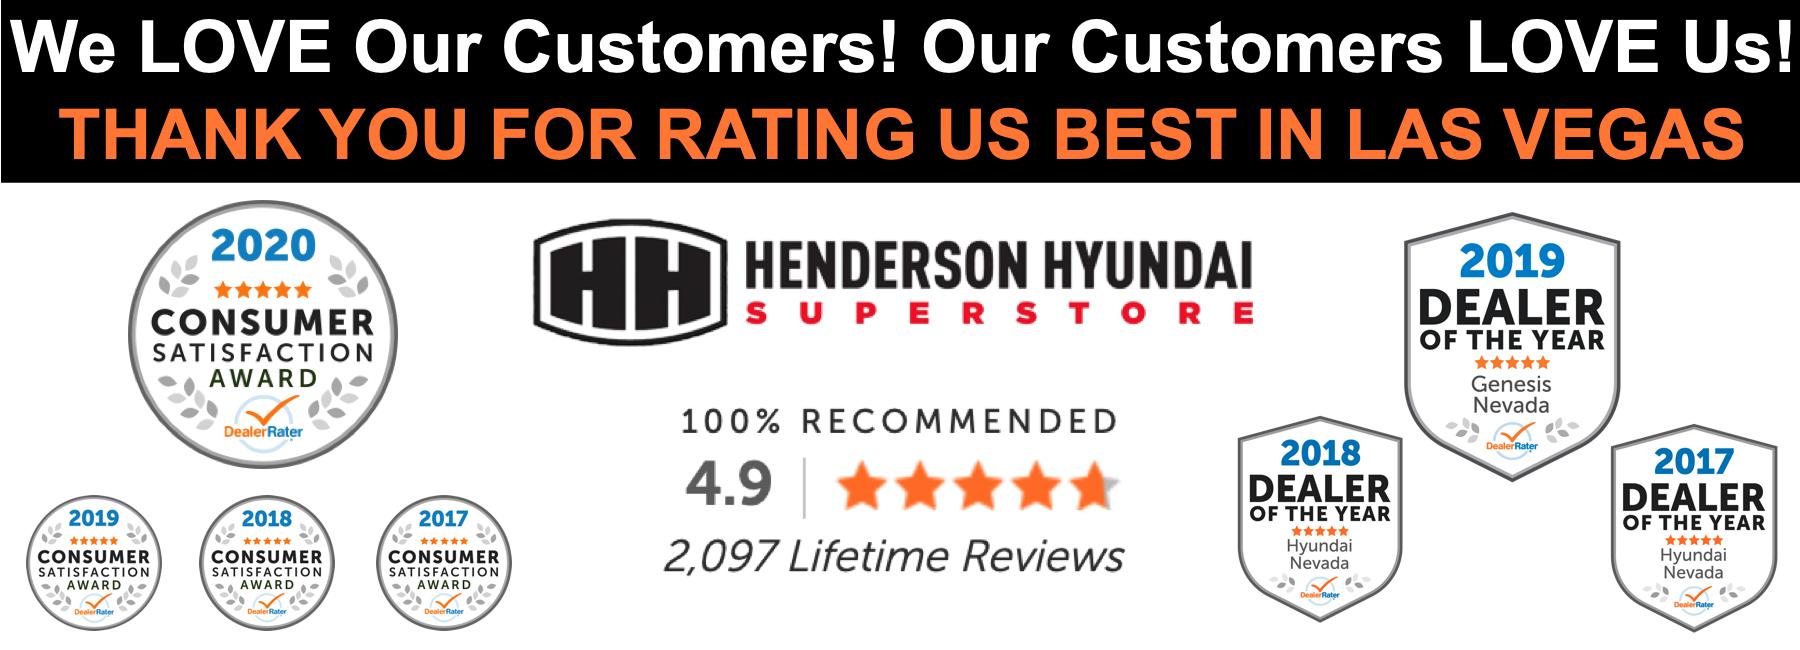 Henderson Hyundai_Reviews Webslider_v2